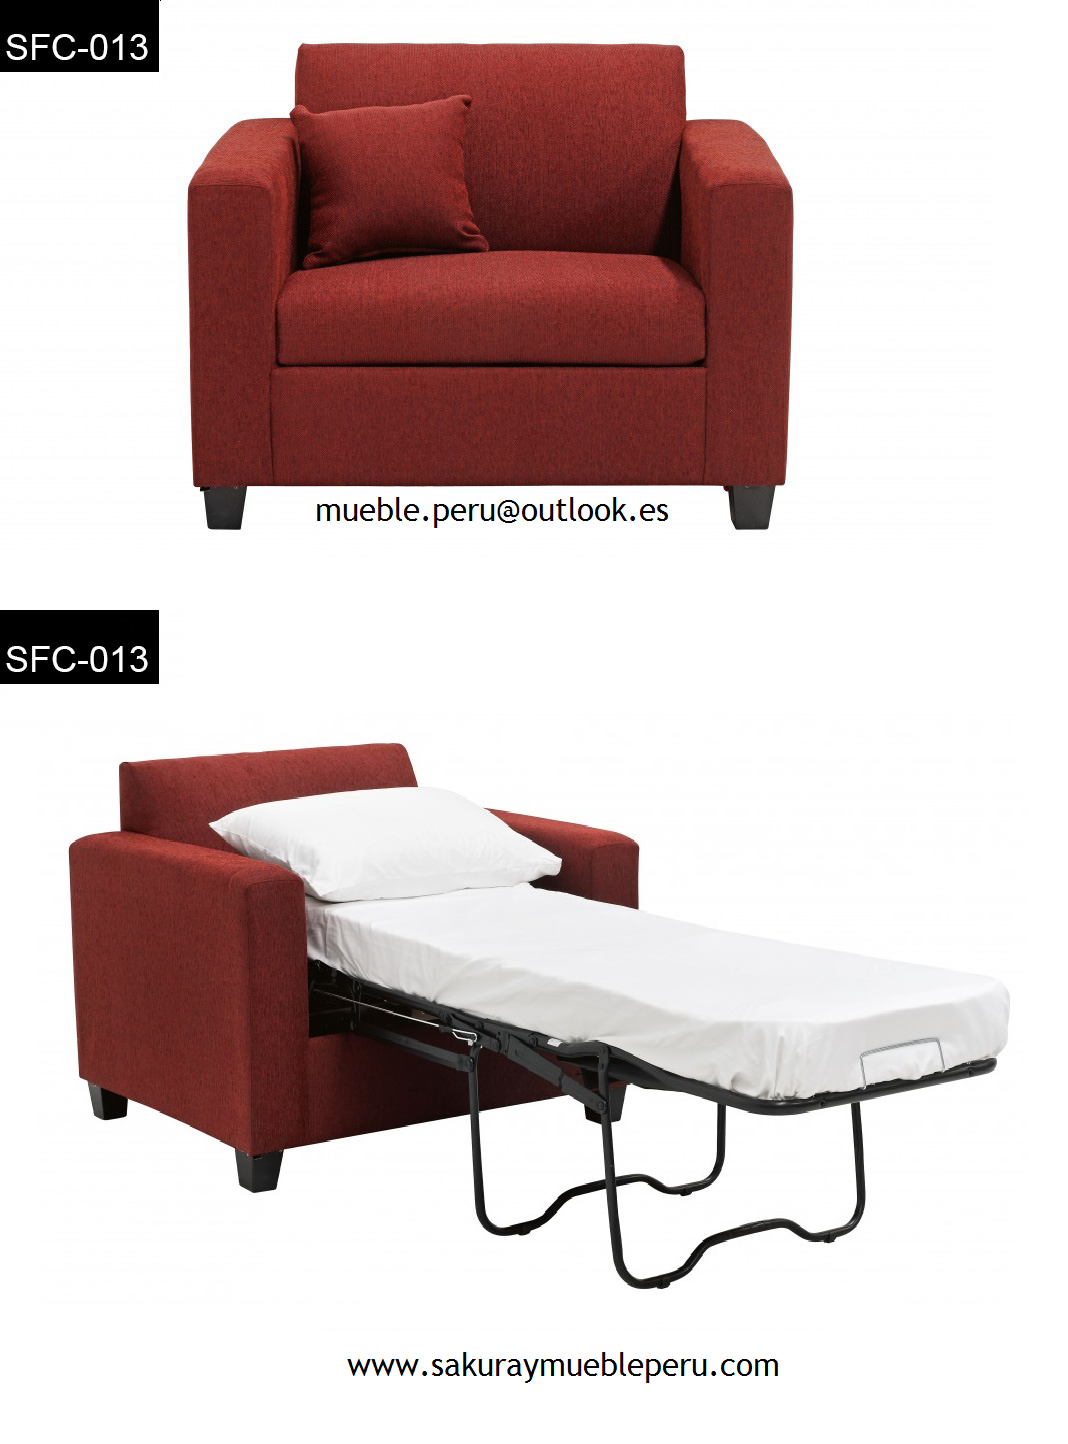 Sofa Sfc Furniture Philippines Mueble Peru Sakuray Cama De 1 Plaza 013